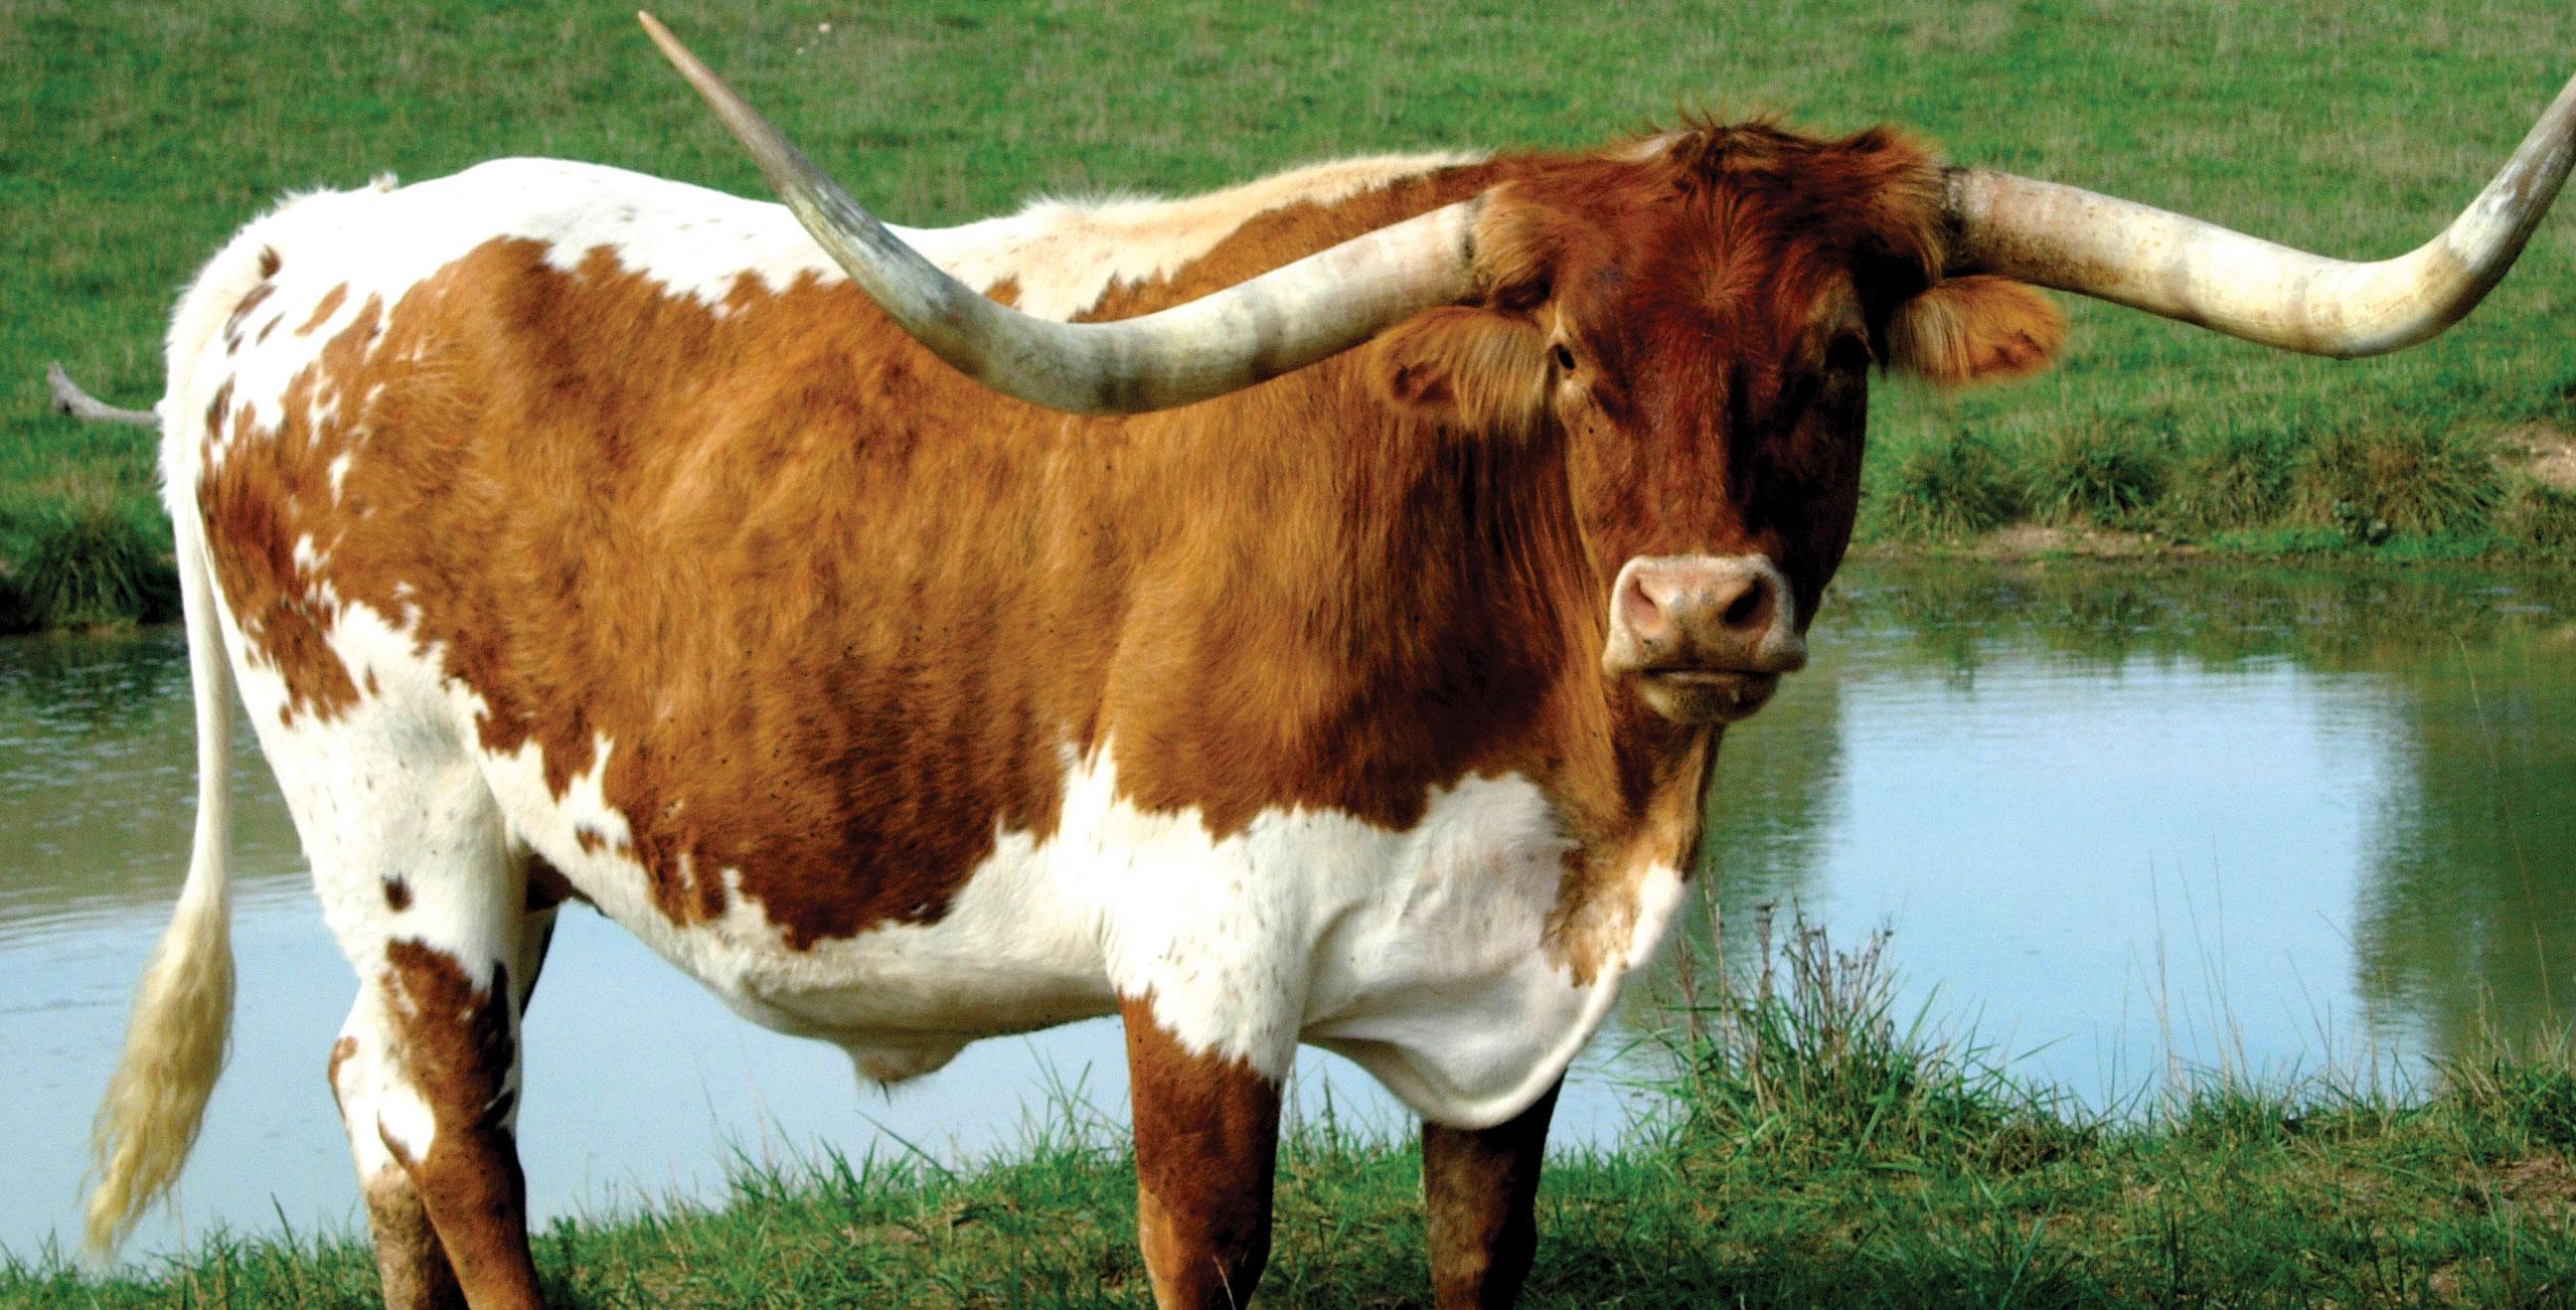 6 Longhorn Cattle HD Wallpapers | Backgrounds - Wallpaper ...